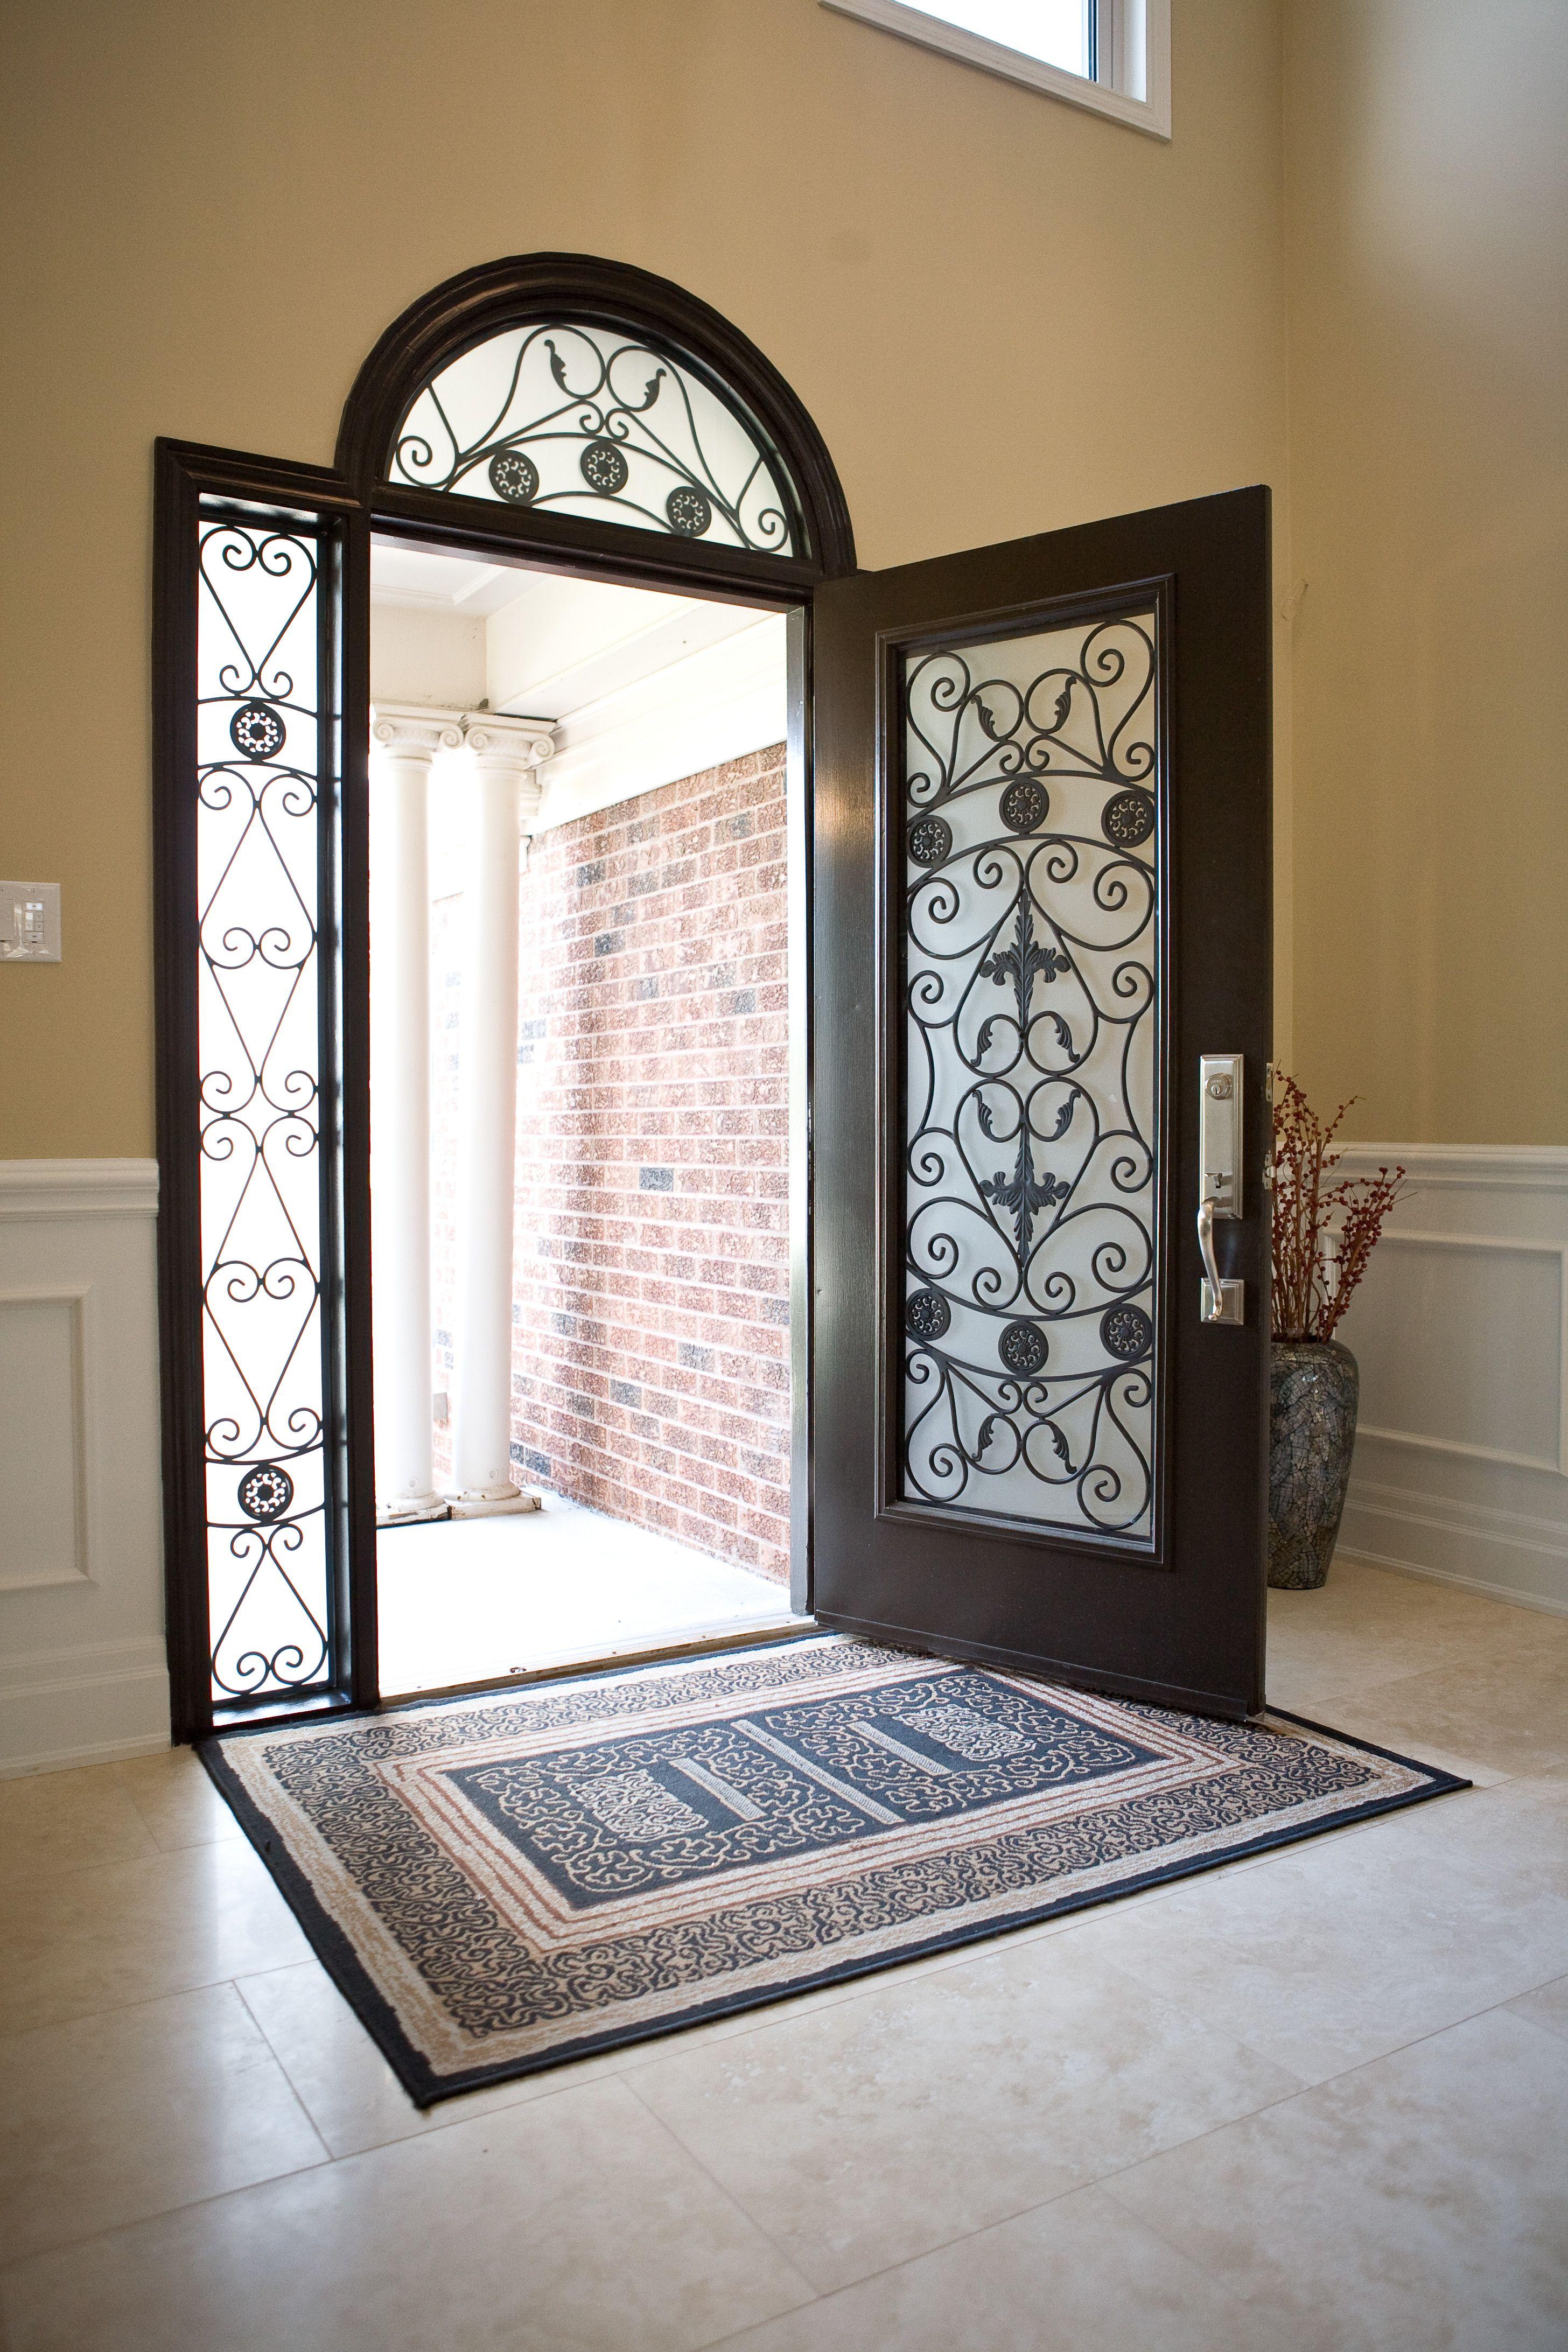 Custom Wrought Iron insert on Fiberglass Door System -Create Your Style Your Way! & Custom Wrought Iron insert on Fiberglass Door System -Create Your ... pezcame.com